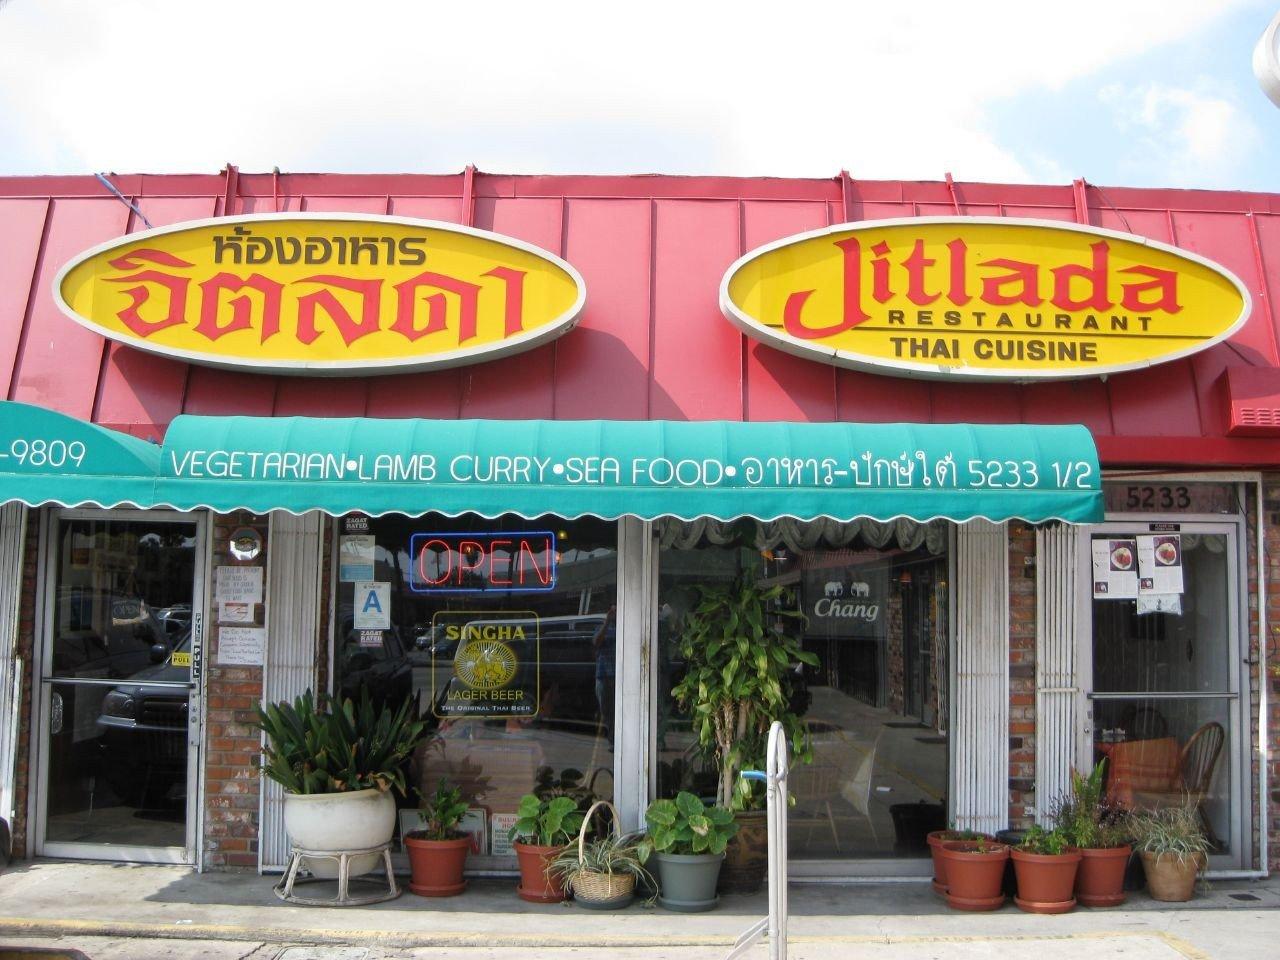 Food + Drink outdoor fast food food restaurant real estate advertising fast food restaurant dish